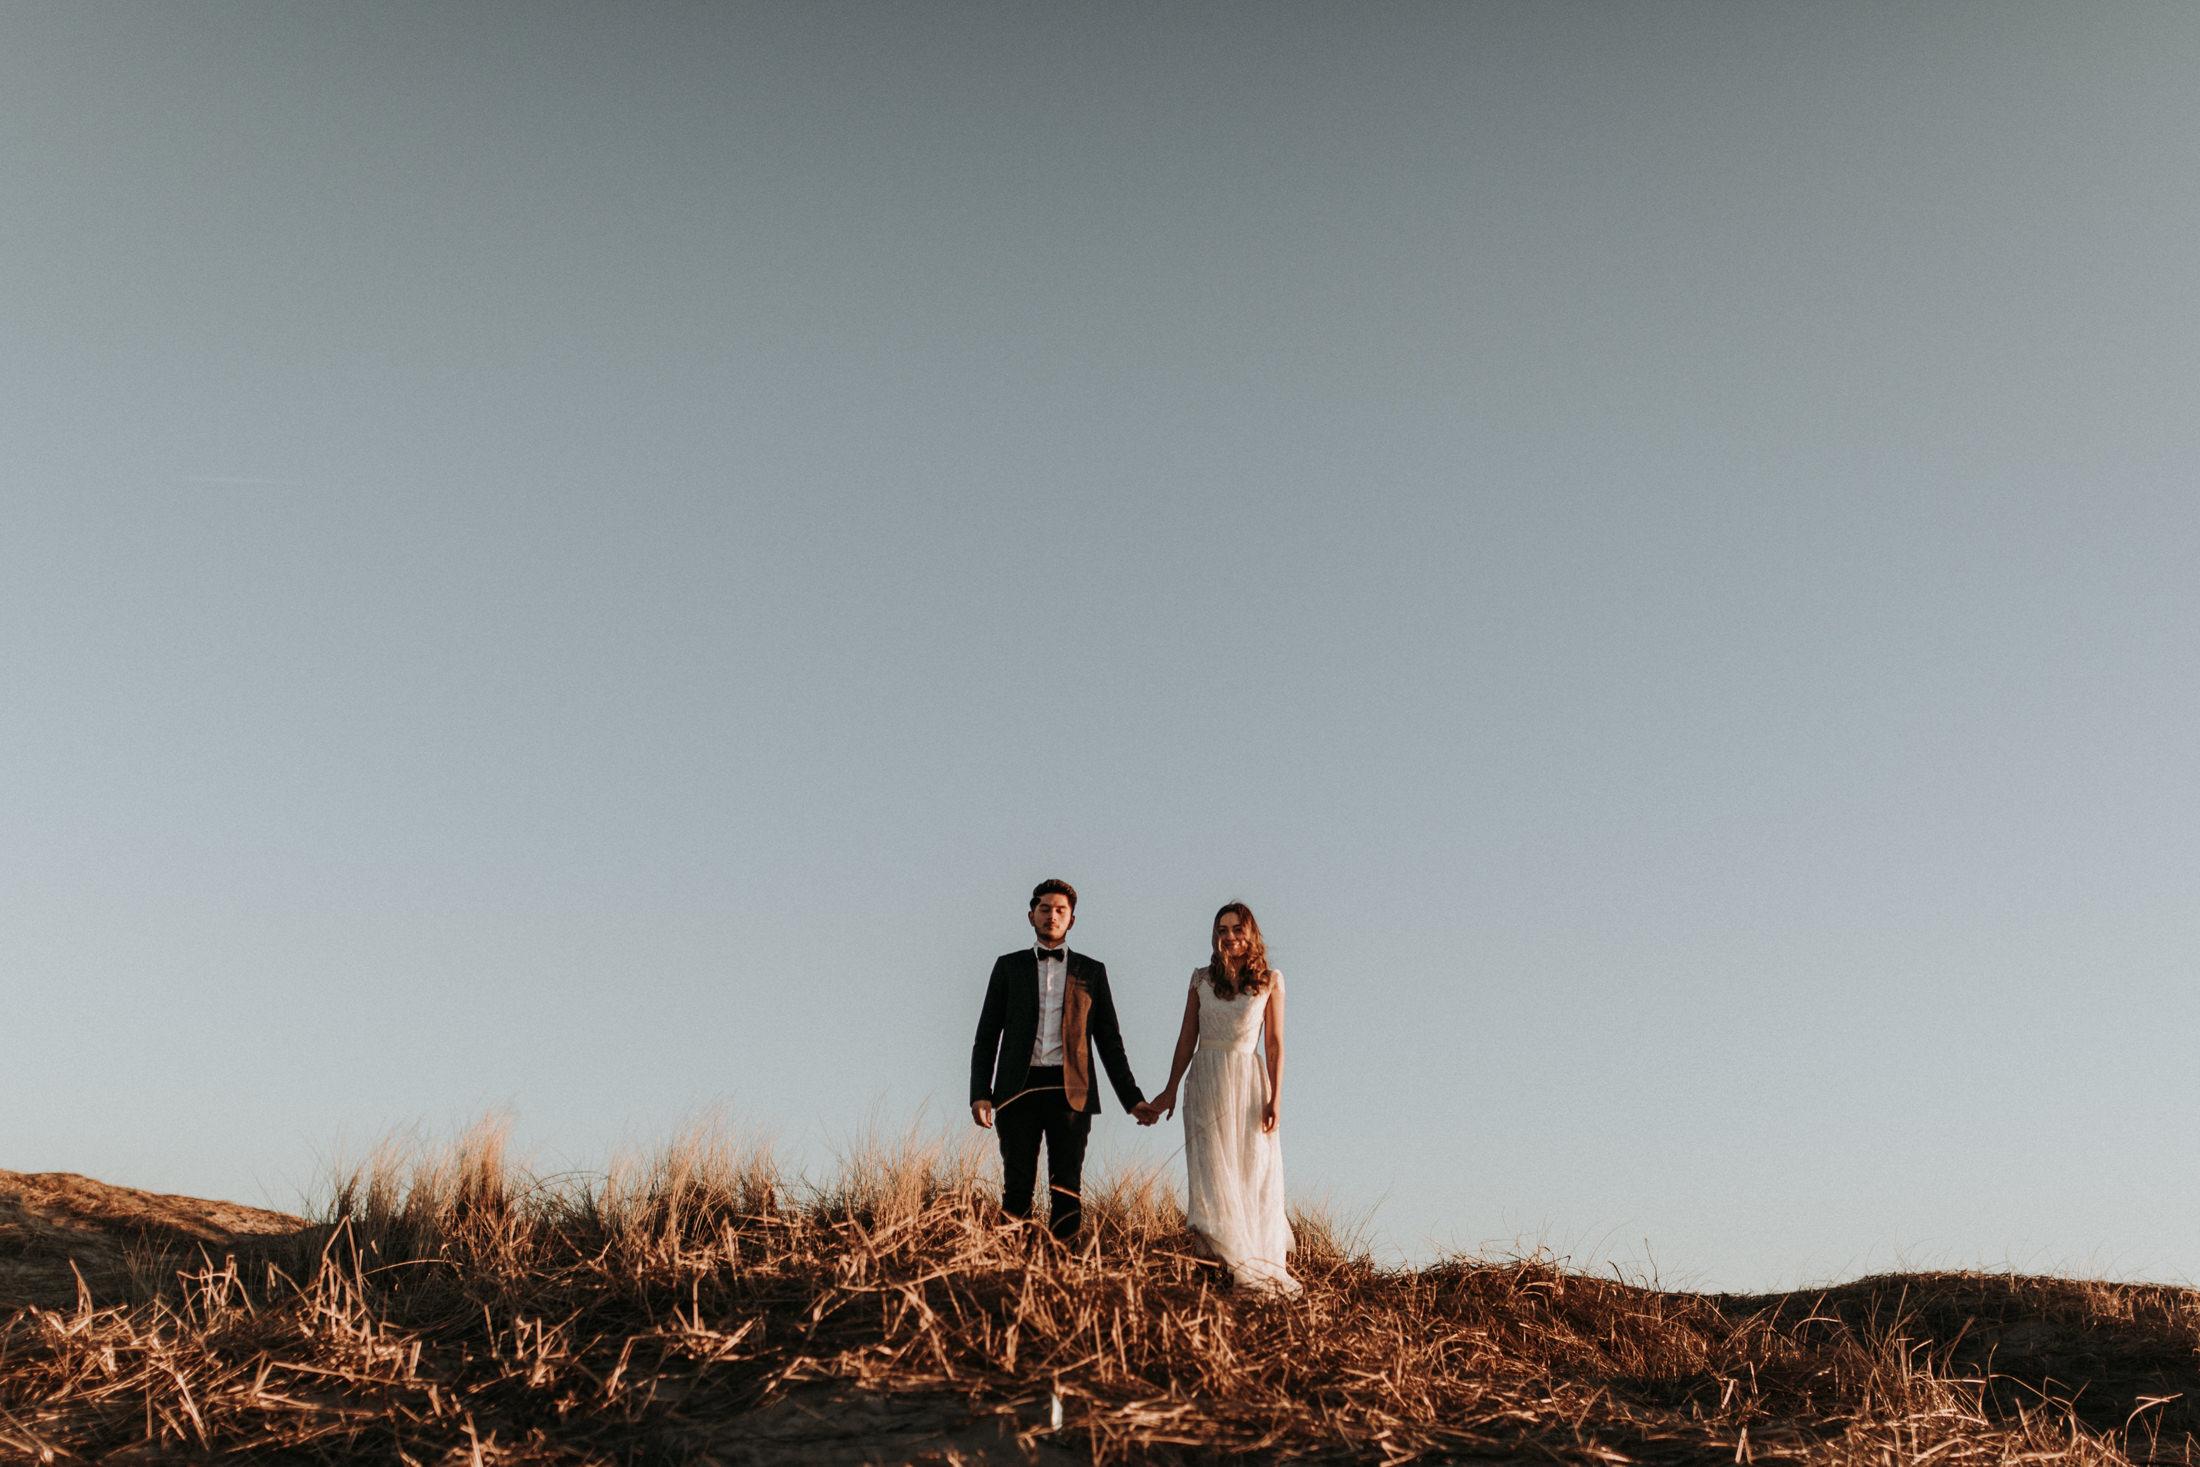 Wedding_Photographer_Mallorca_Daniela-Marquardt_Photography_CanaryIslands_Lanzarote_Iceland_Tuskany_Santorini_Portugal_Schweiz_Austria_Bayern_Elopement_Hochzeitsfotograf_Norddeichich_49